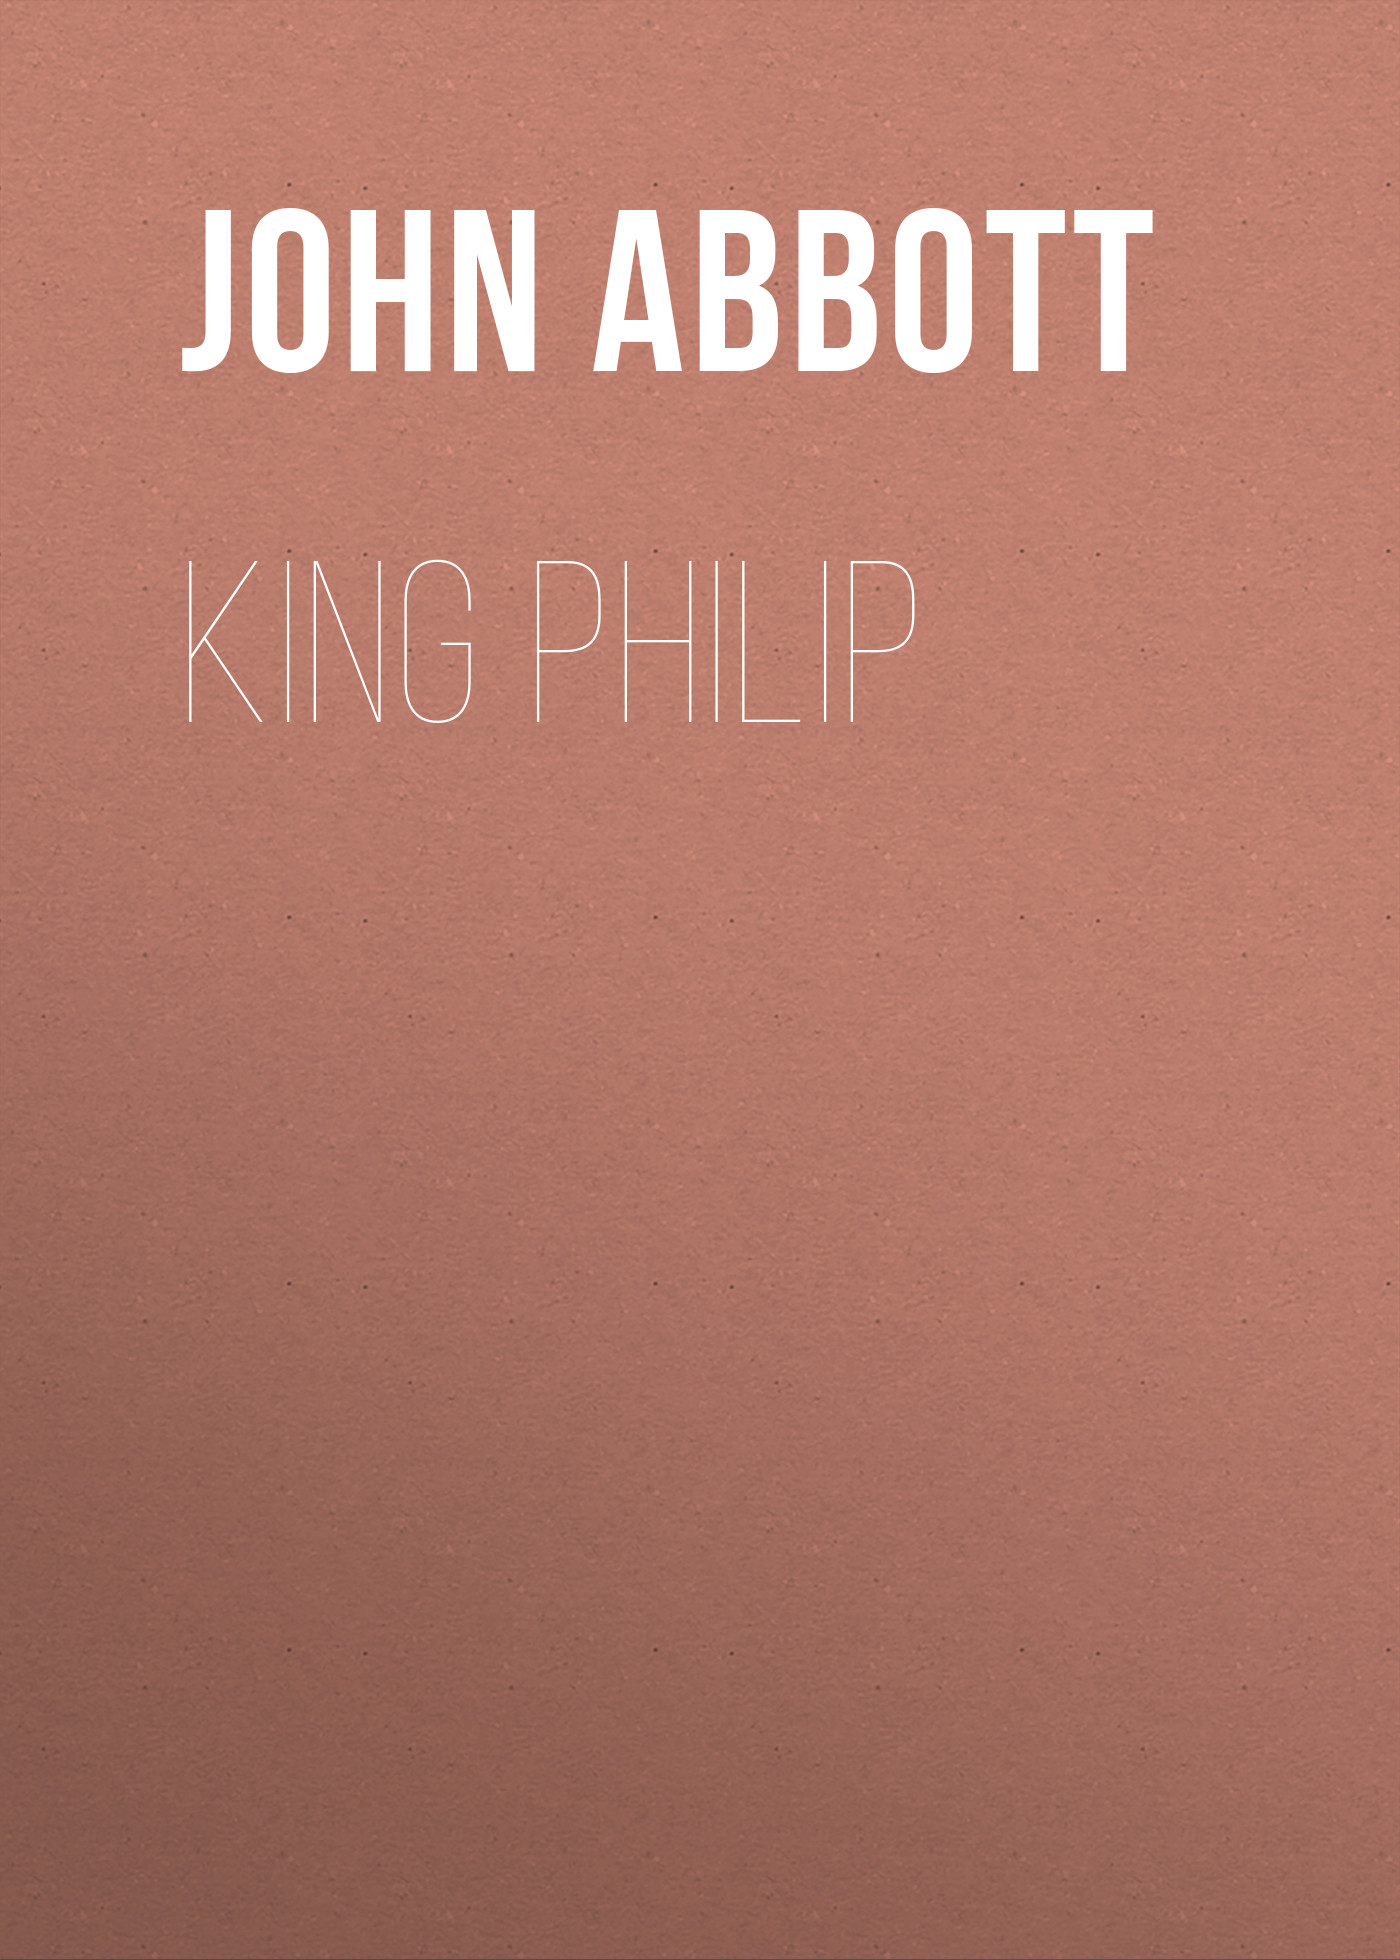 все цены на Abbott John Stevens Cabot King Philip онлайн